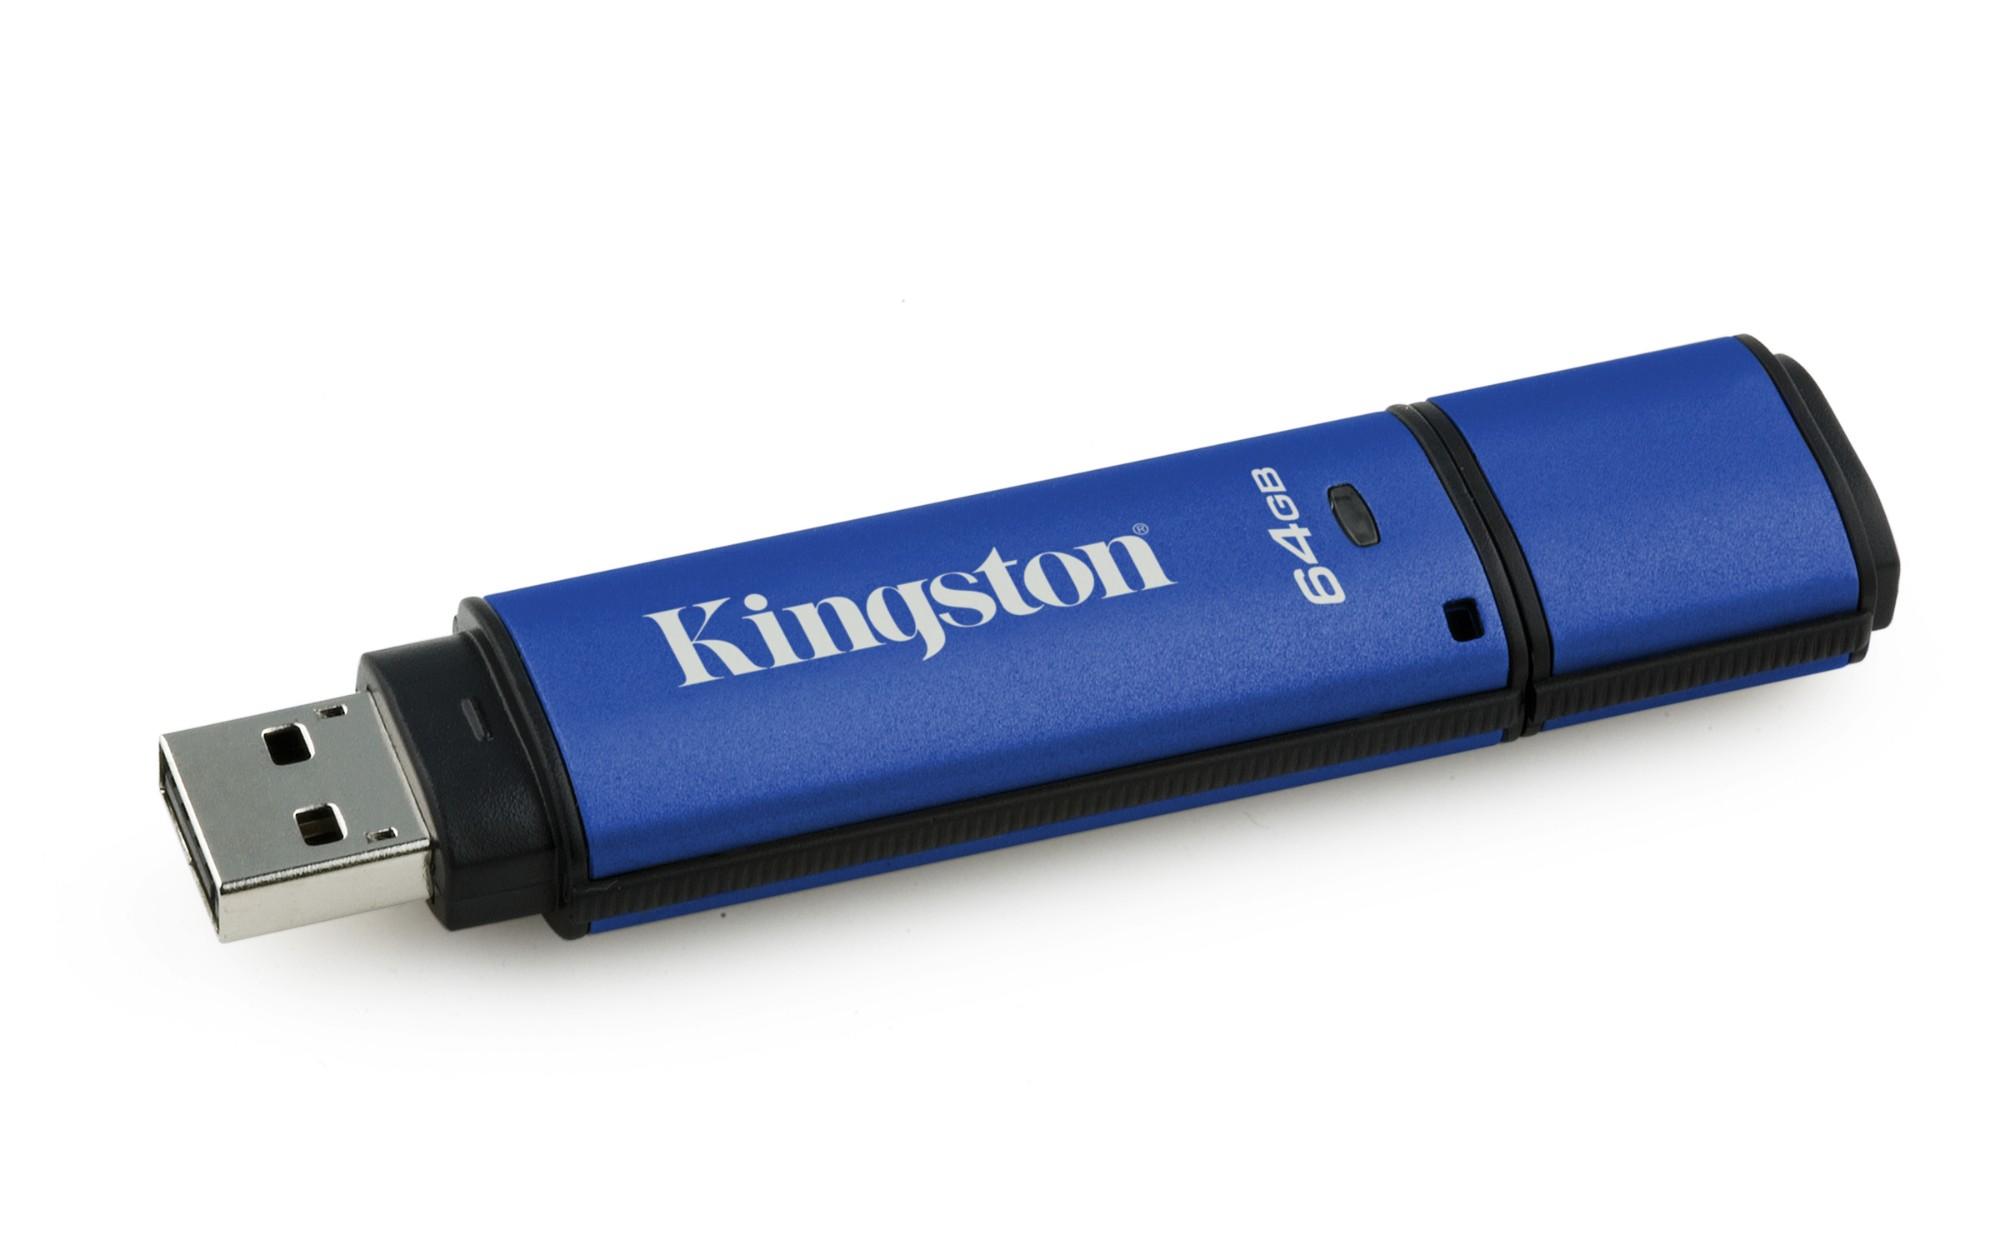 Kingston Technology DataTraveler Vault Privacy 3.0 with Management 64GB 64GB USB 3.0 (3.1 Gen 1) Type-A Black,Blue USB flash drive